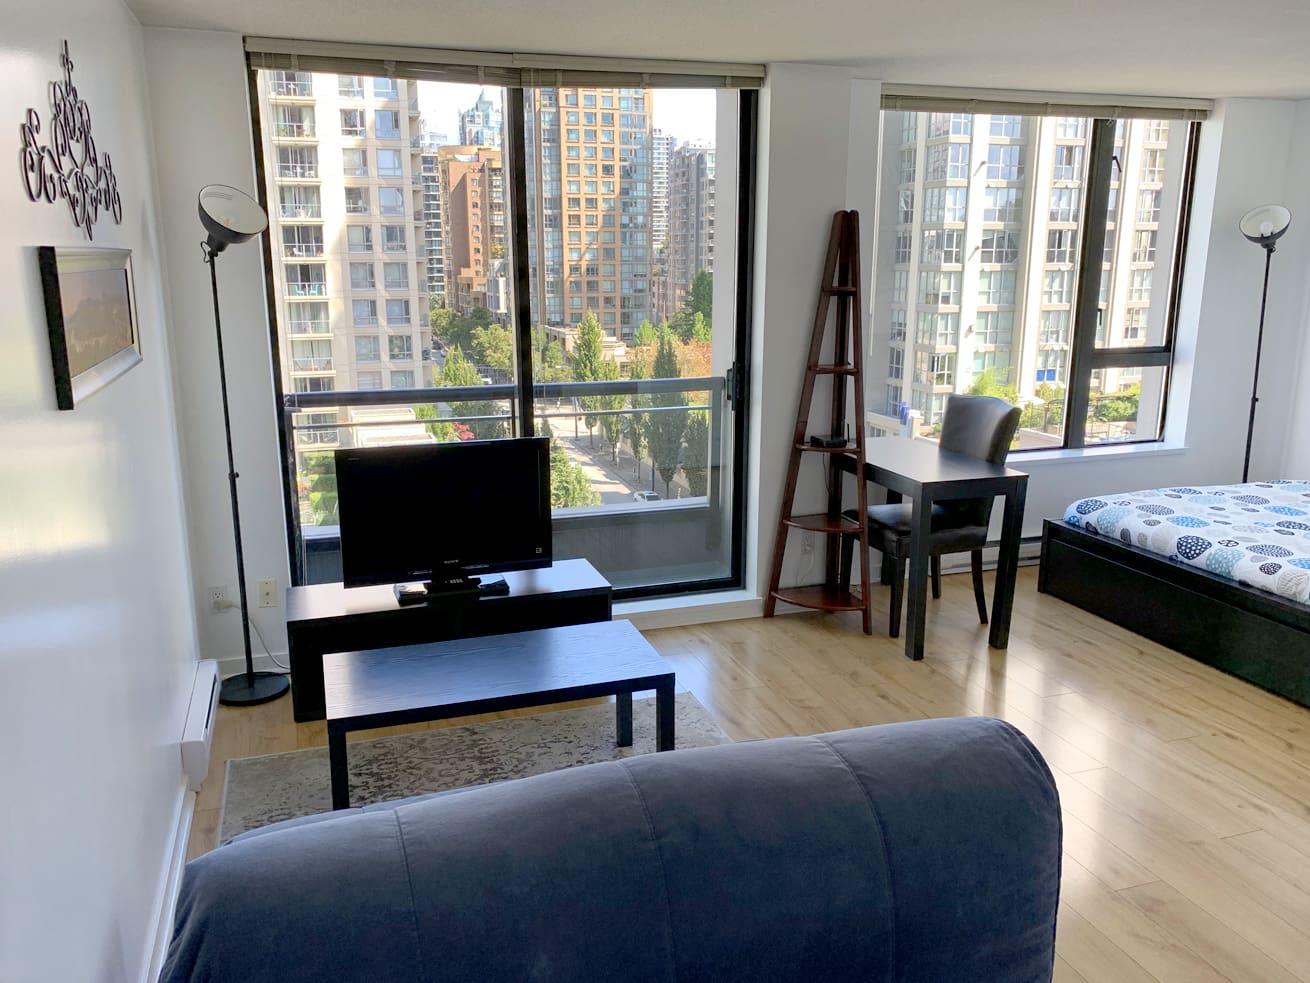 Vancouver apartments for rent oscar studio balcony desk